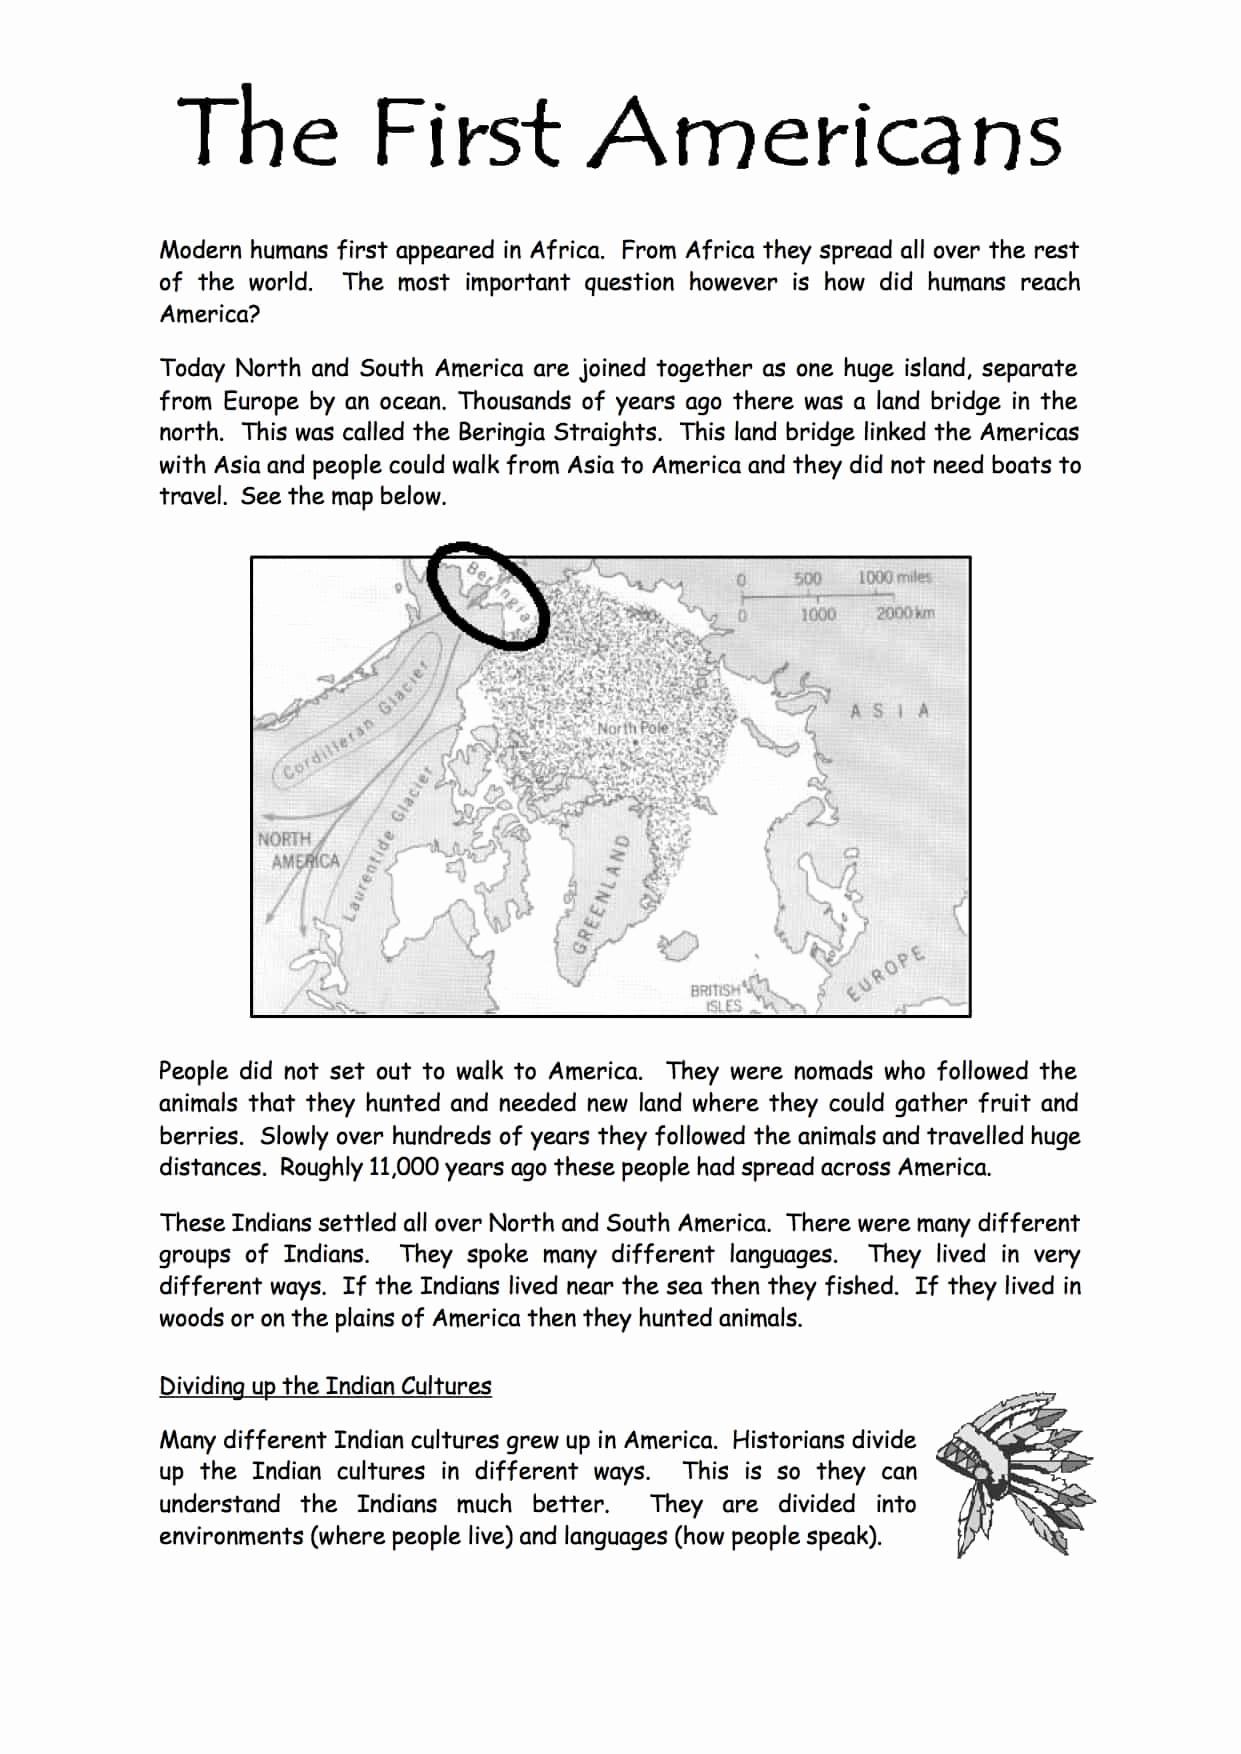 Free Us History Worksheets Inspirational Free History Worksheets